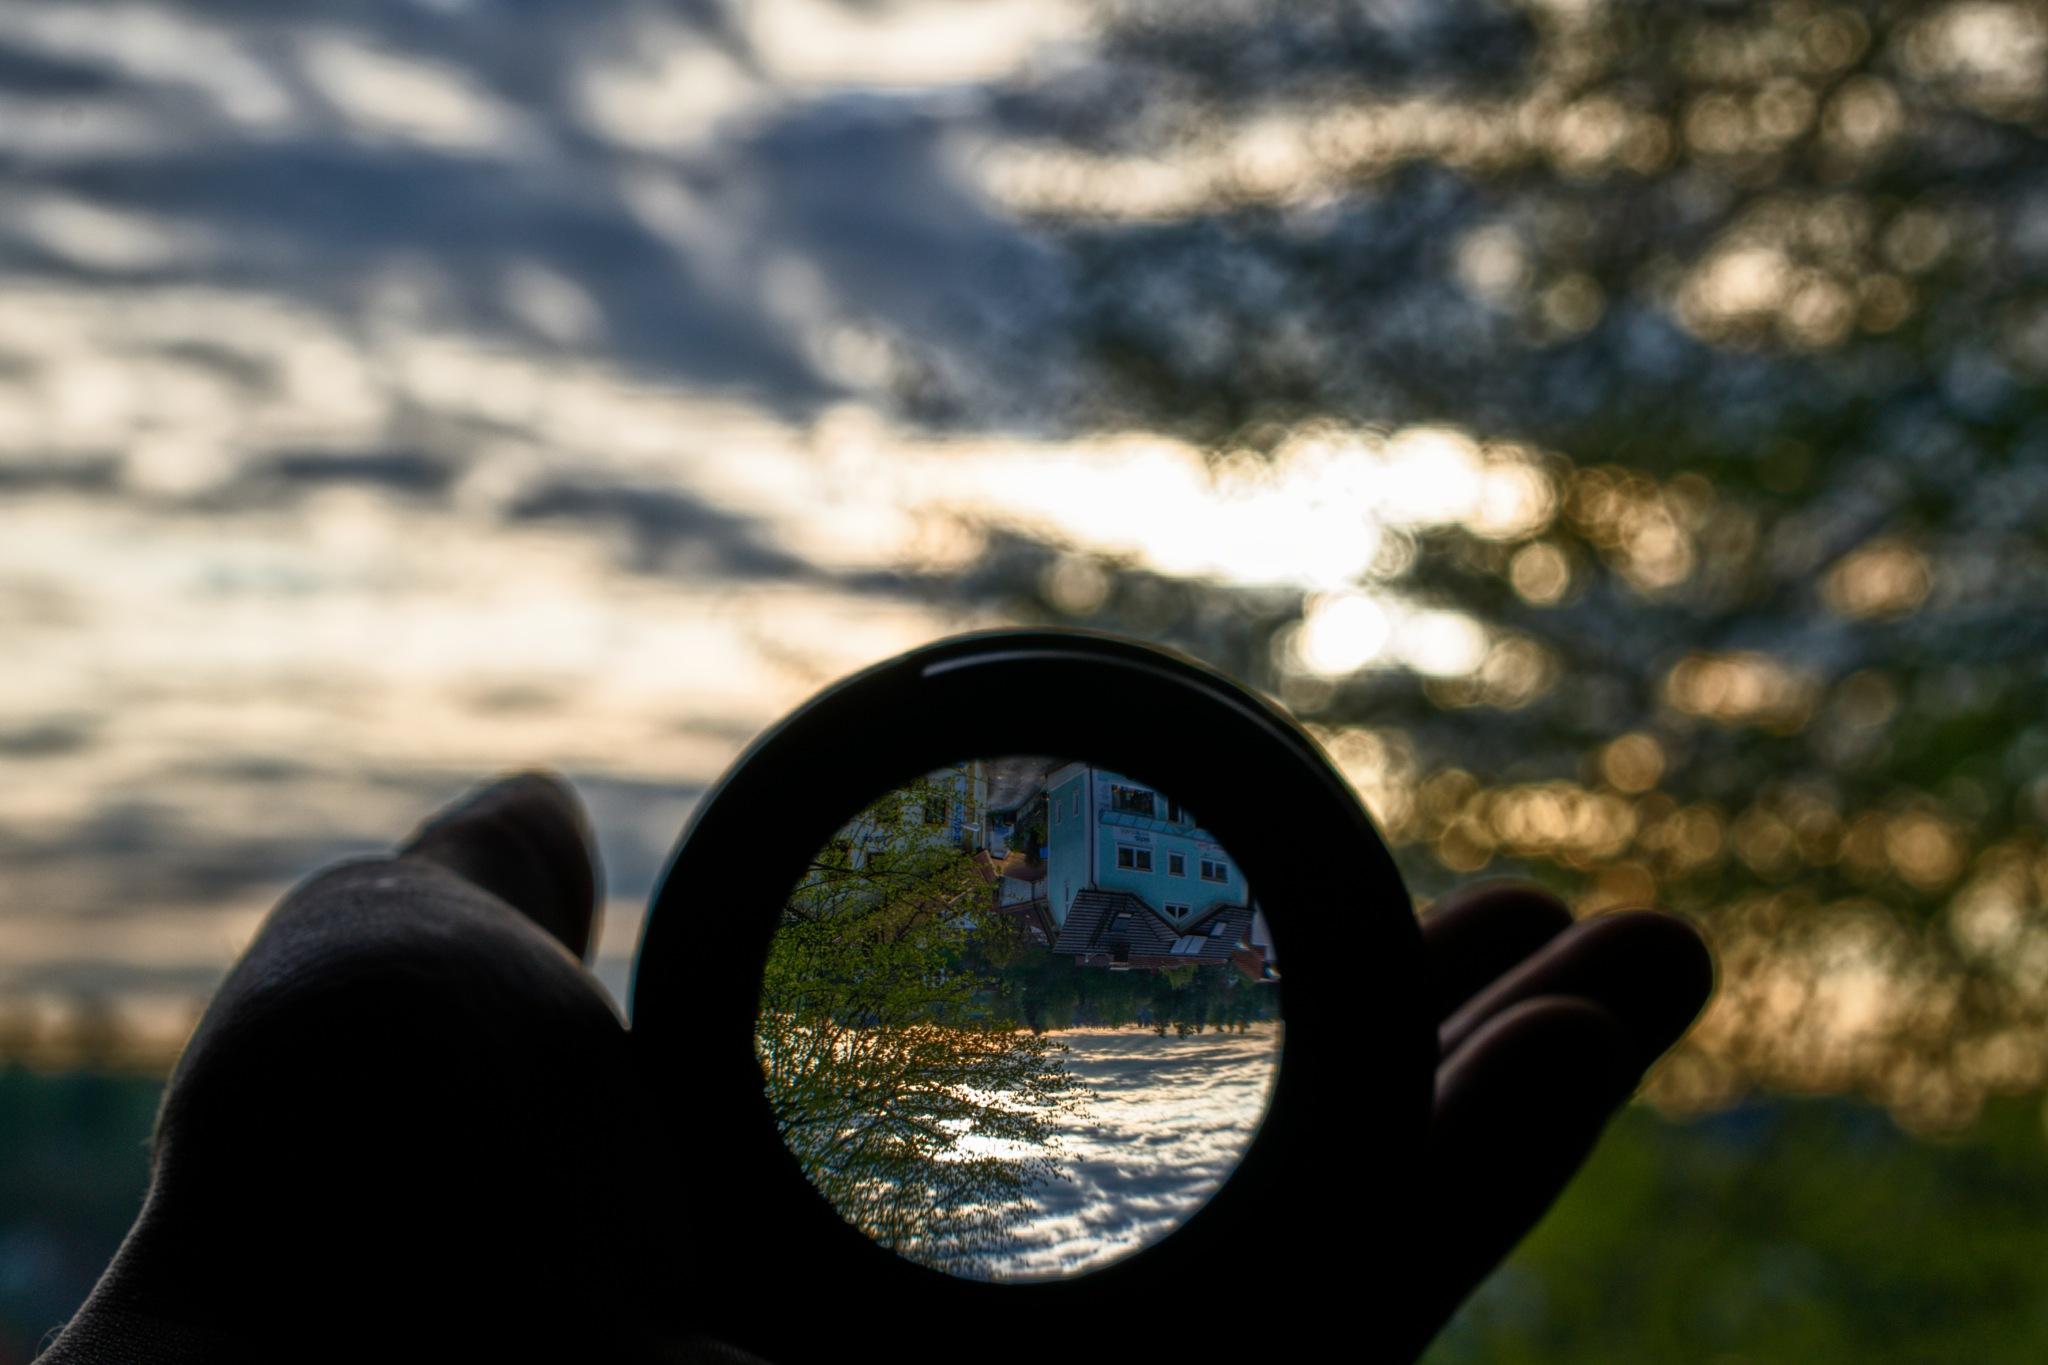 lens sunset by david freund